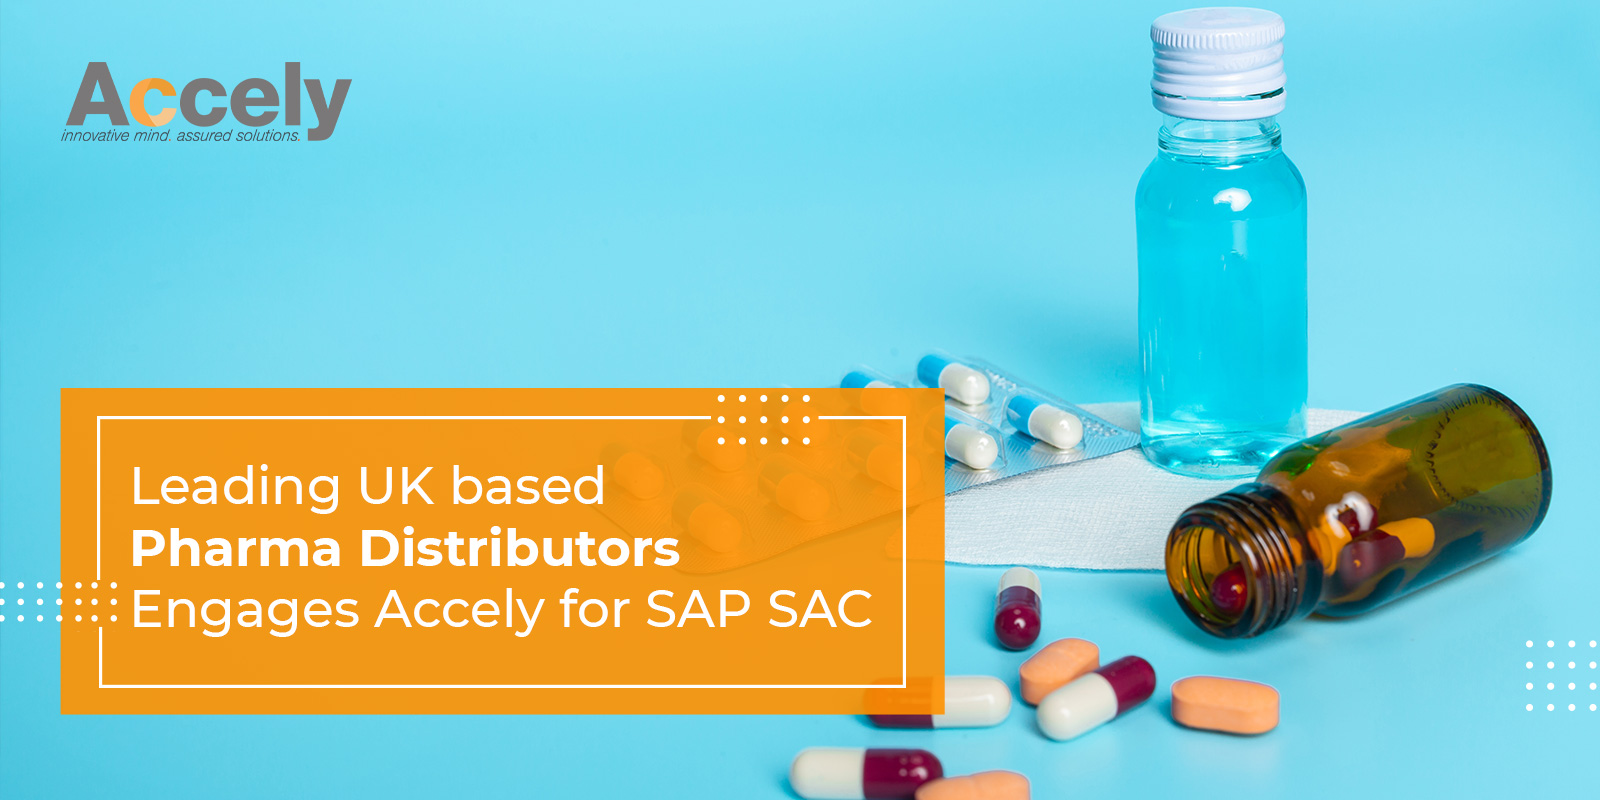 Leading UK based Pharma Distributors Engages Accely for SAP SAC